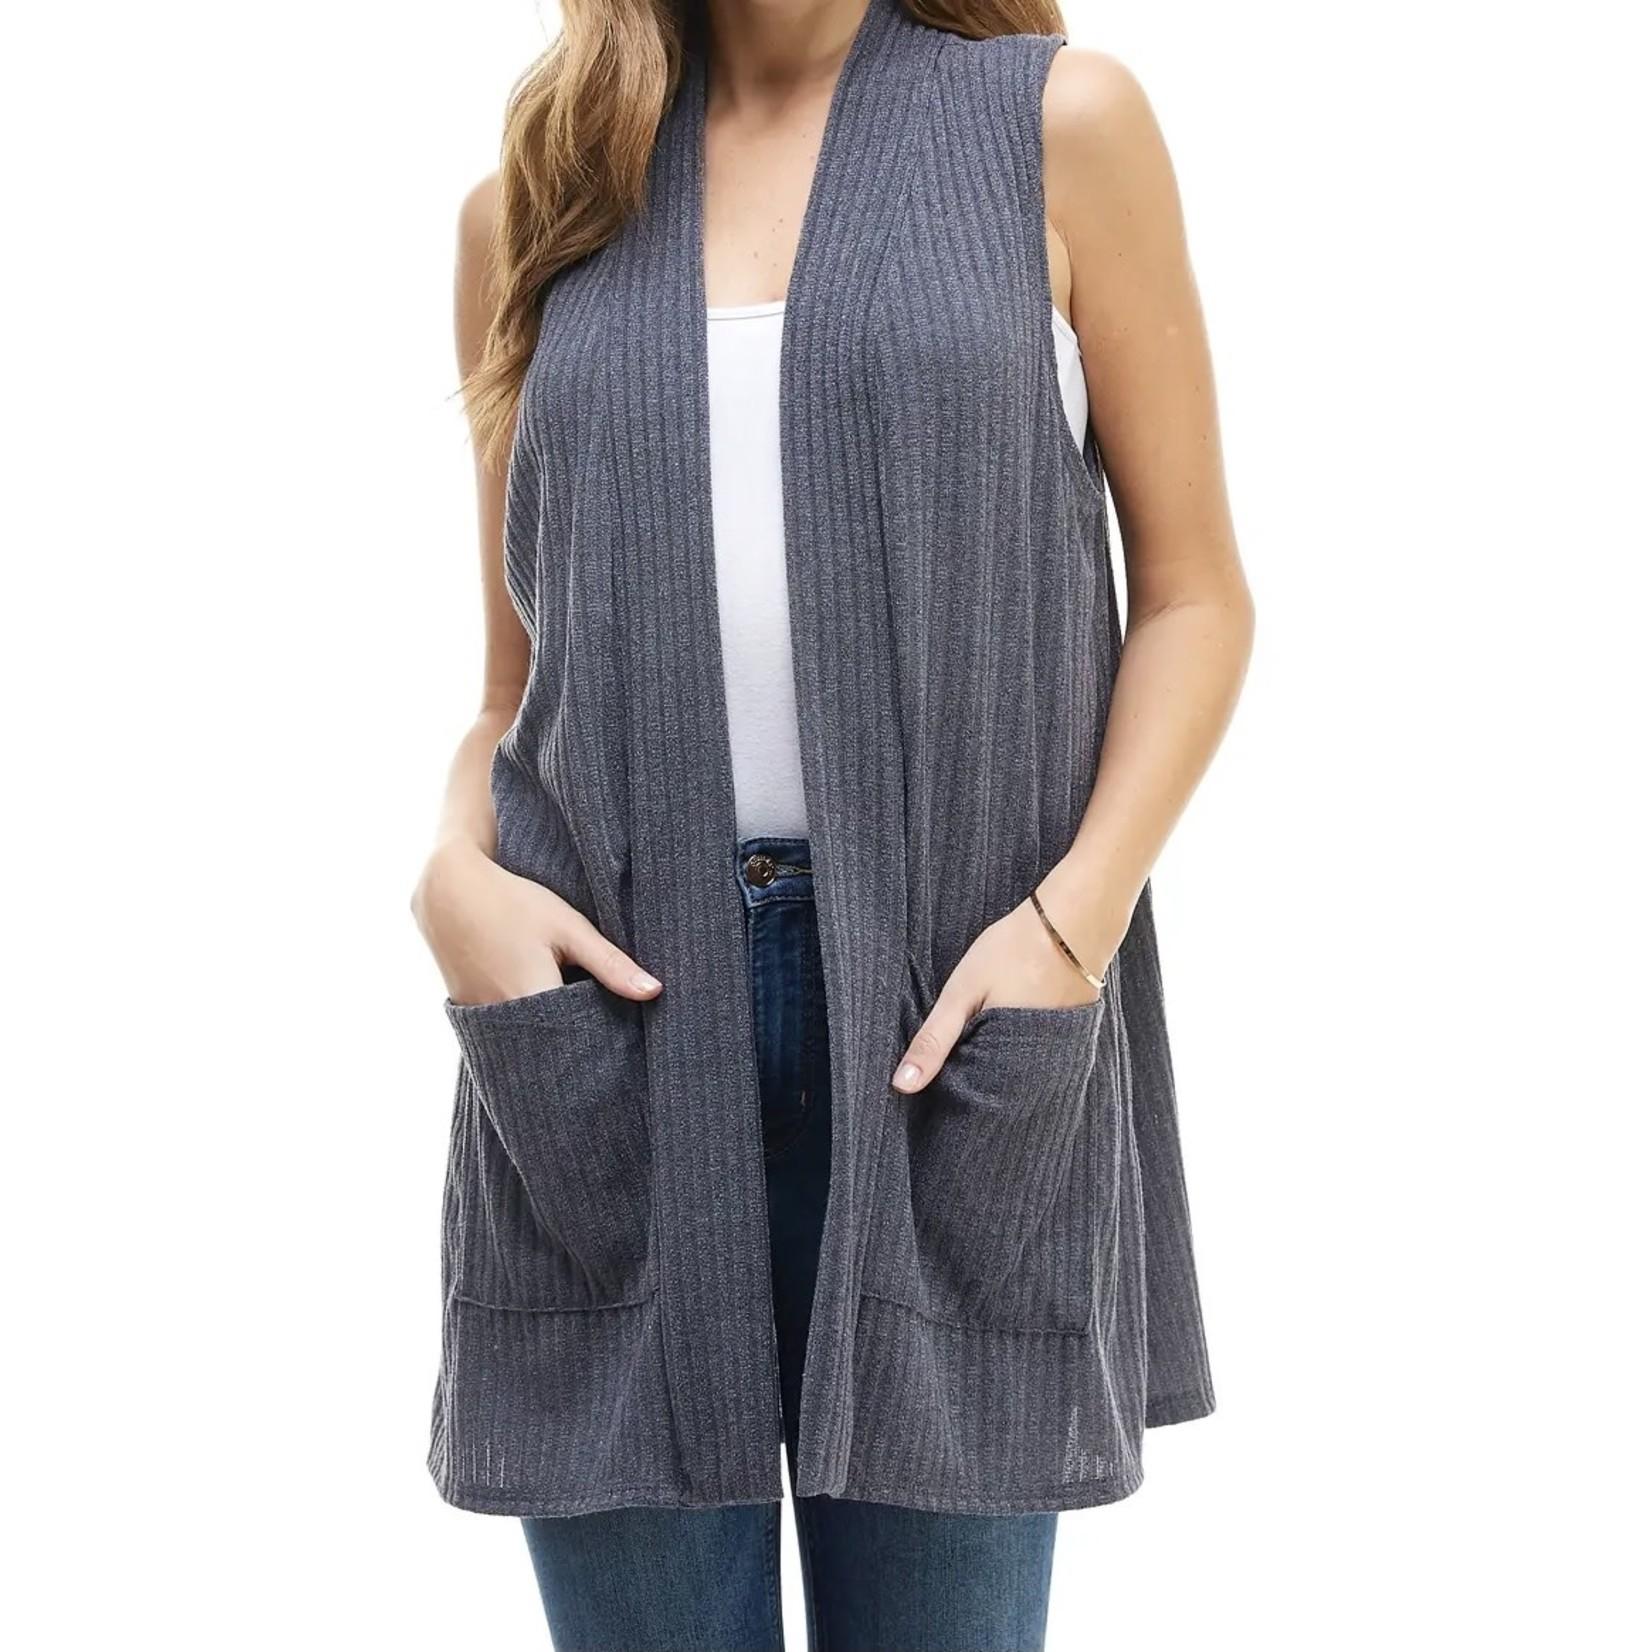 Azules Vest: Brushed Ribbed + Pockets